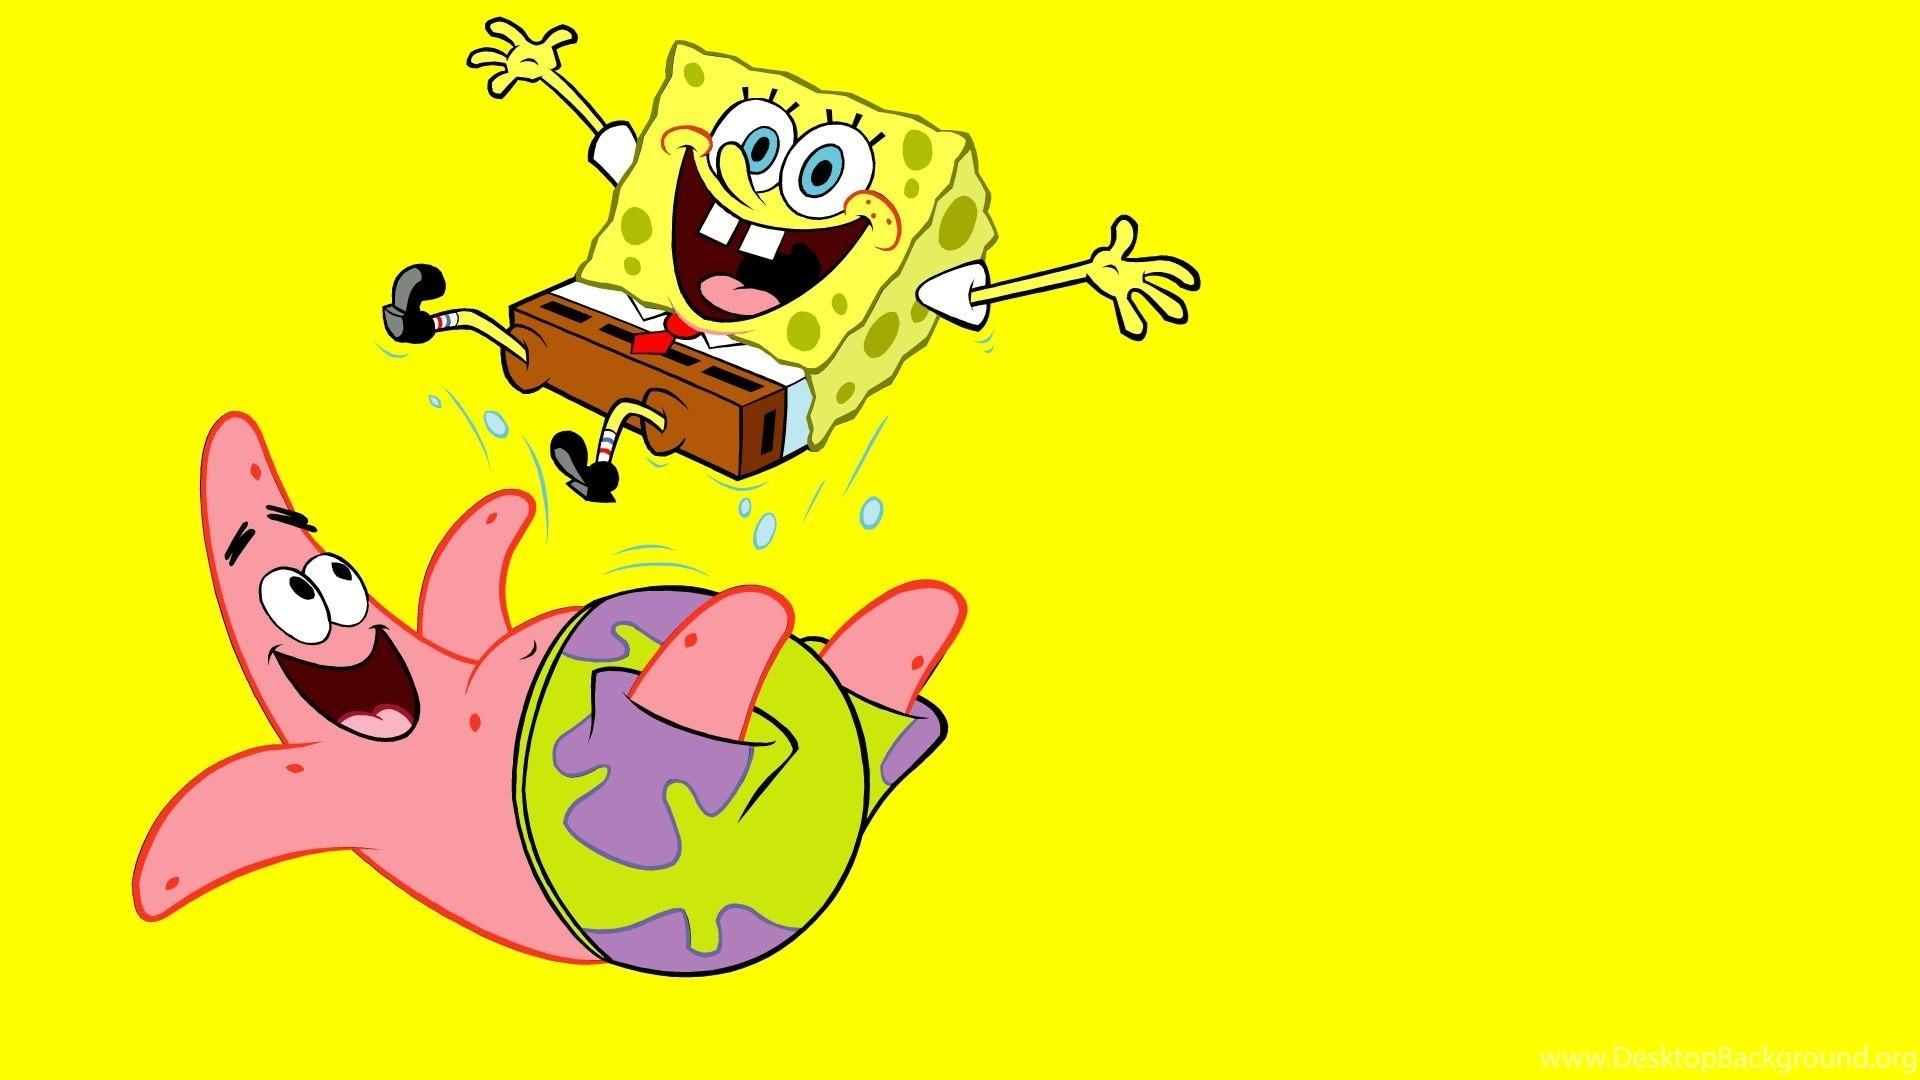 Res: 1920x1080, 3840x2160 Wallpaper The spongebob movie sponge out of water, The spongebob  movie, Art, Wave HD, Picture, Image